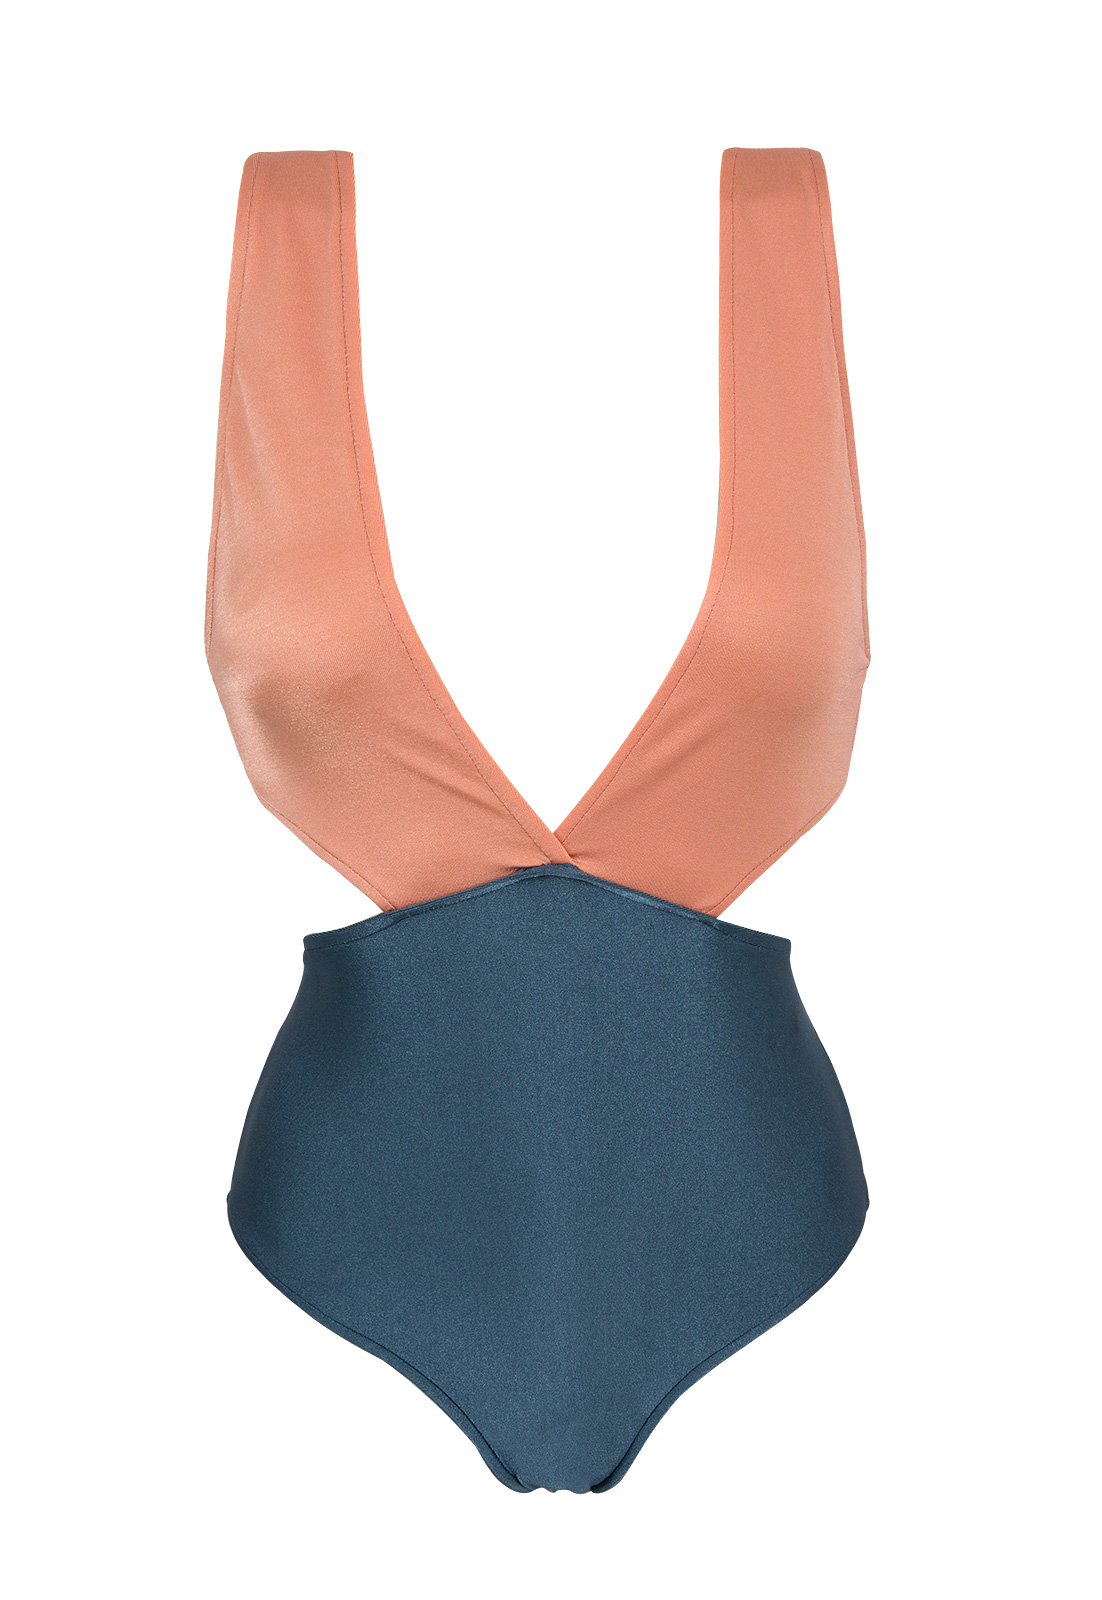 b6464c552 Plunging Textured Monokini - Steel Blue   Pink Peach - Trikini Rose Blue - Rio  de Sol